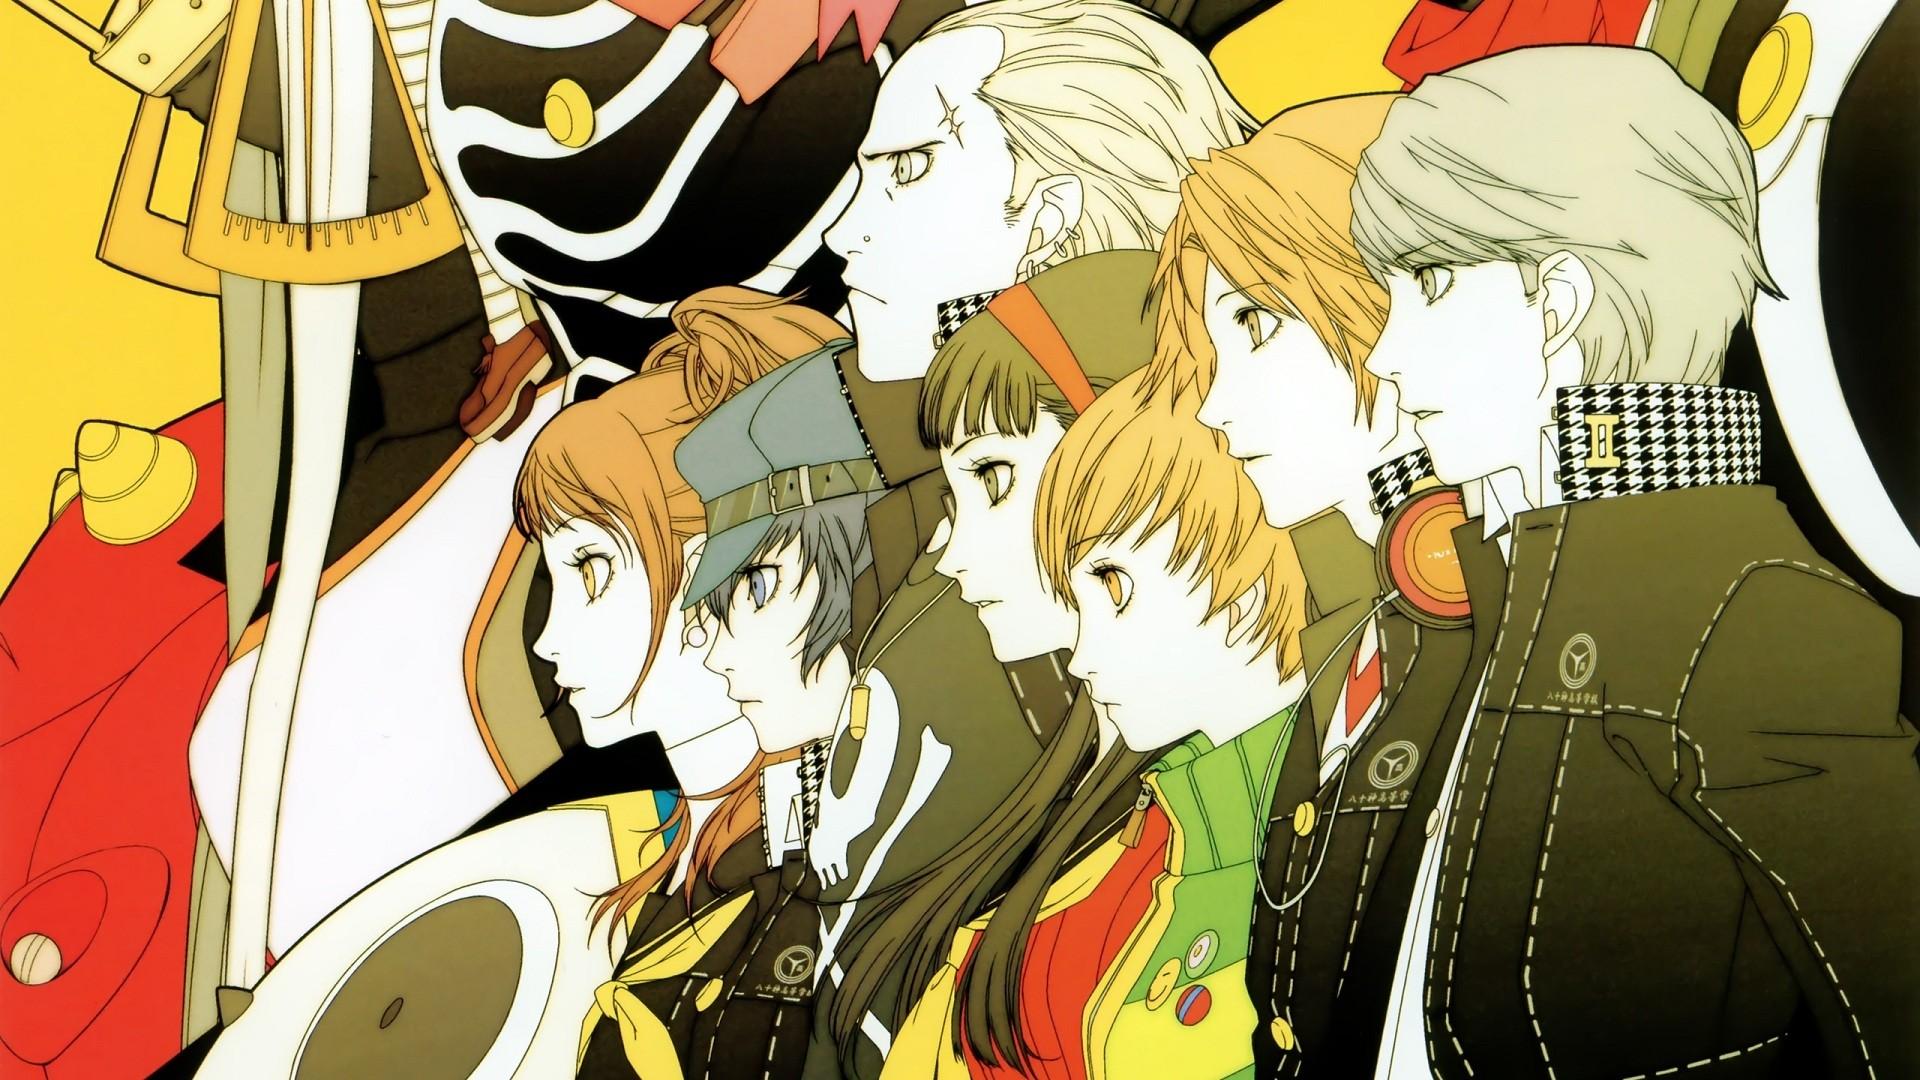 Nahu and Friends: Persona 4 (Undub) [PS2]